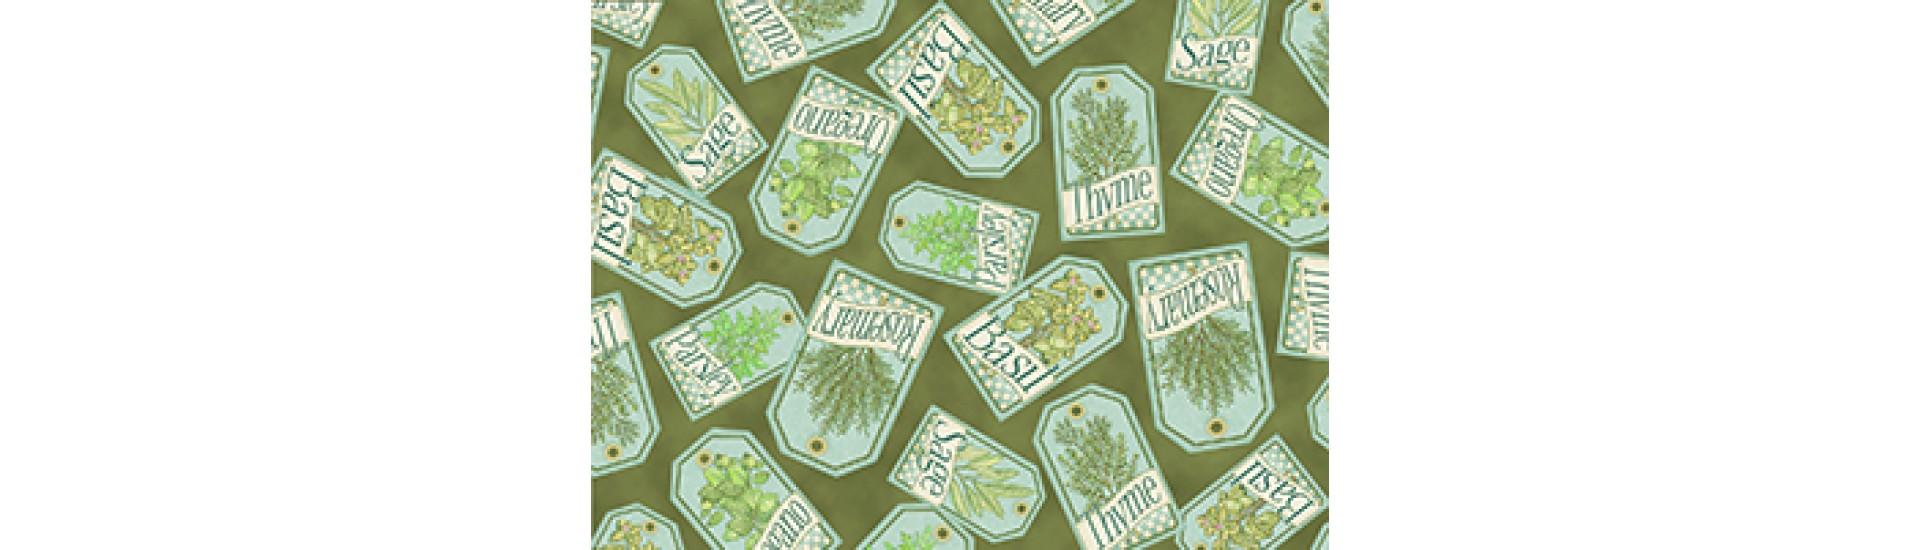 "Ткани для пэчворка Quilting Treasures ""Сад трав"" (цена указана за отрез длиной 5,49м)"